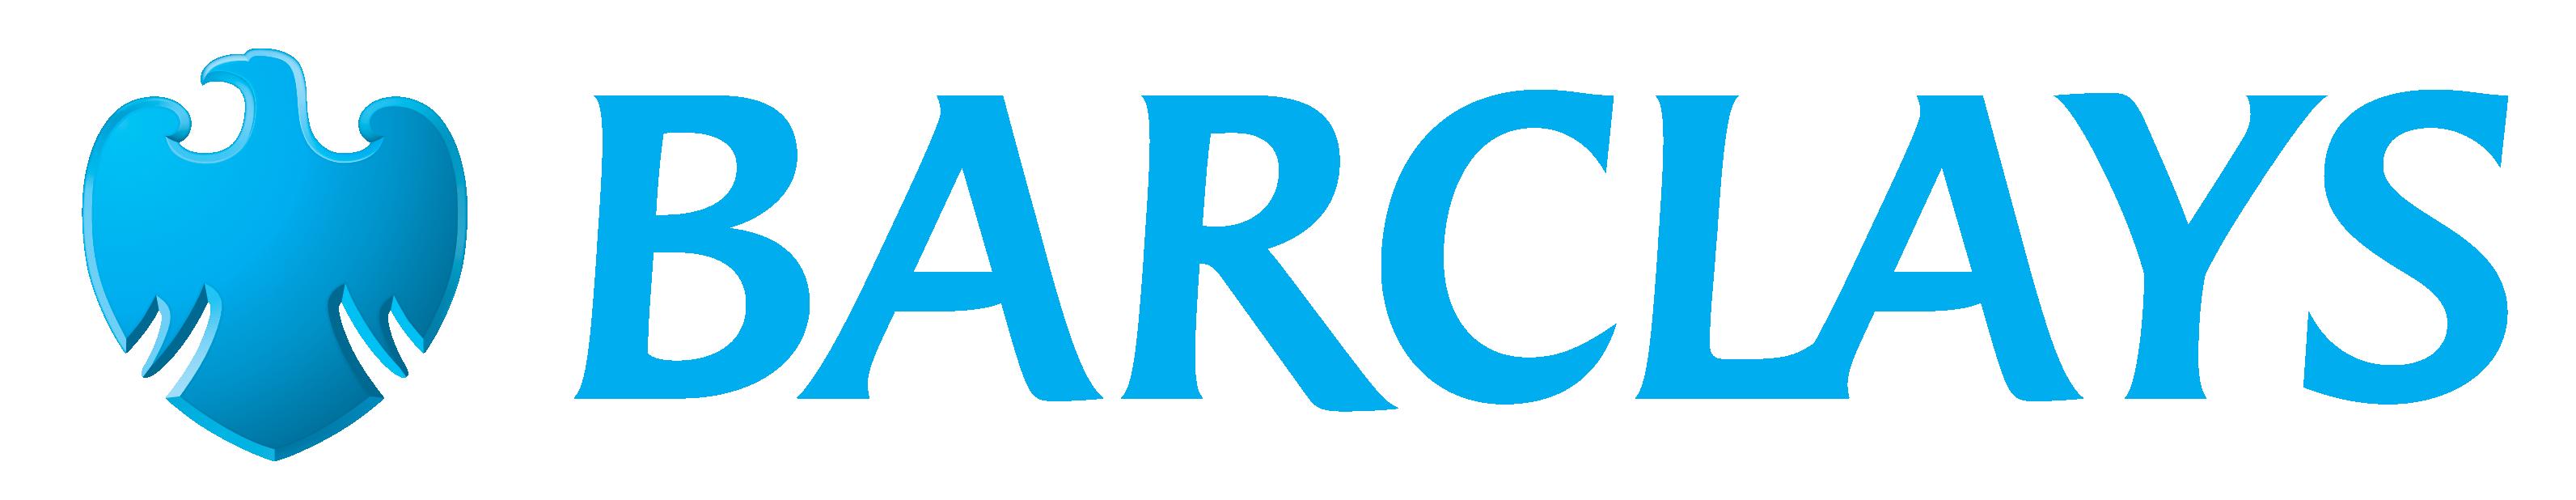 Barclays: تحسن ثقة المستهلك يُنبئ بتعافي معدلات الإنفاق خلال الربع الثالث